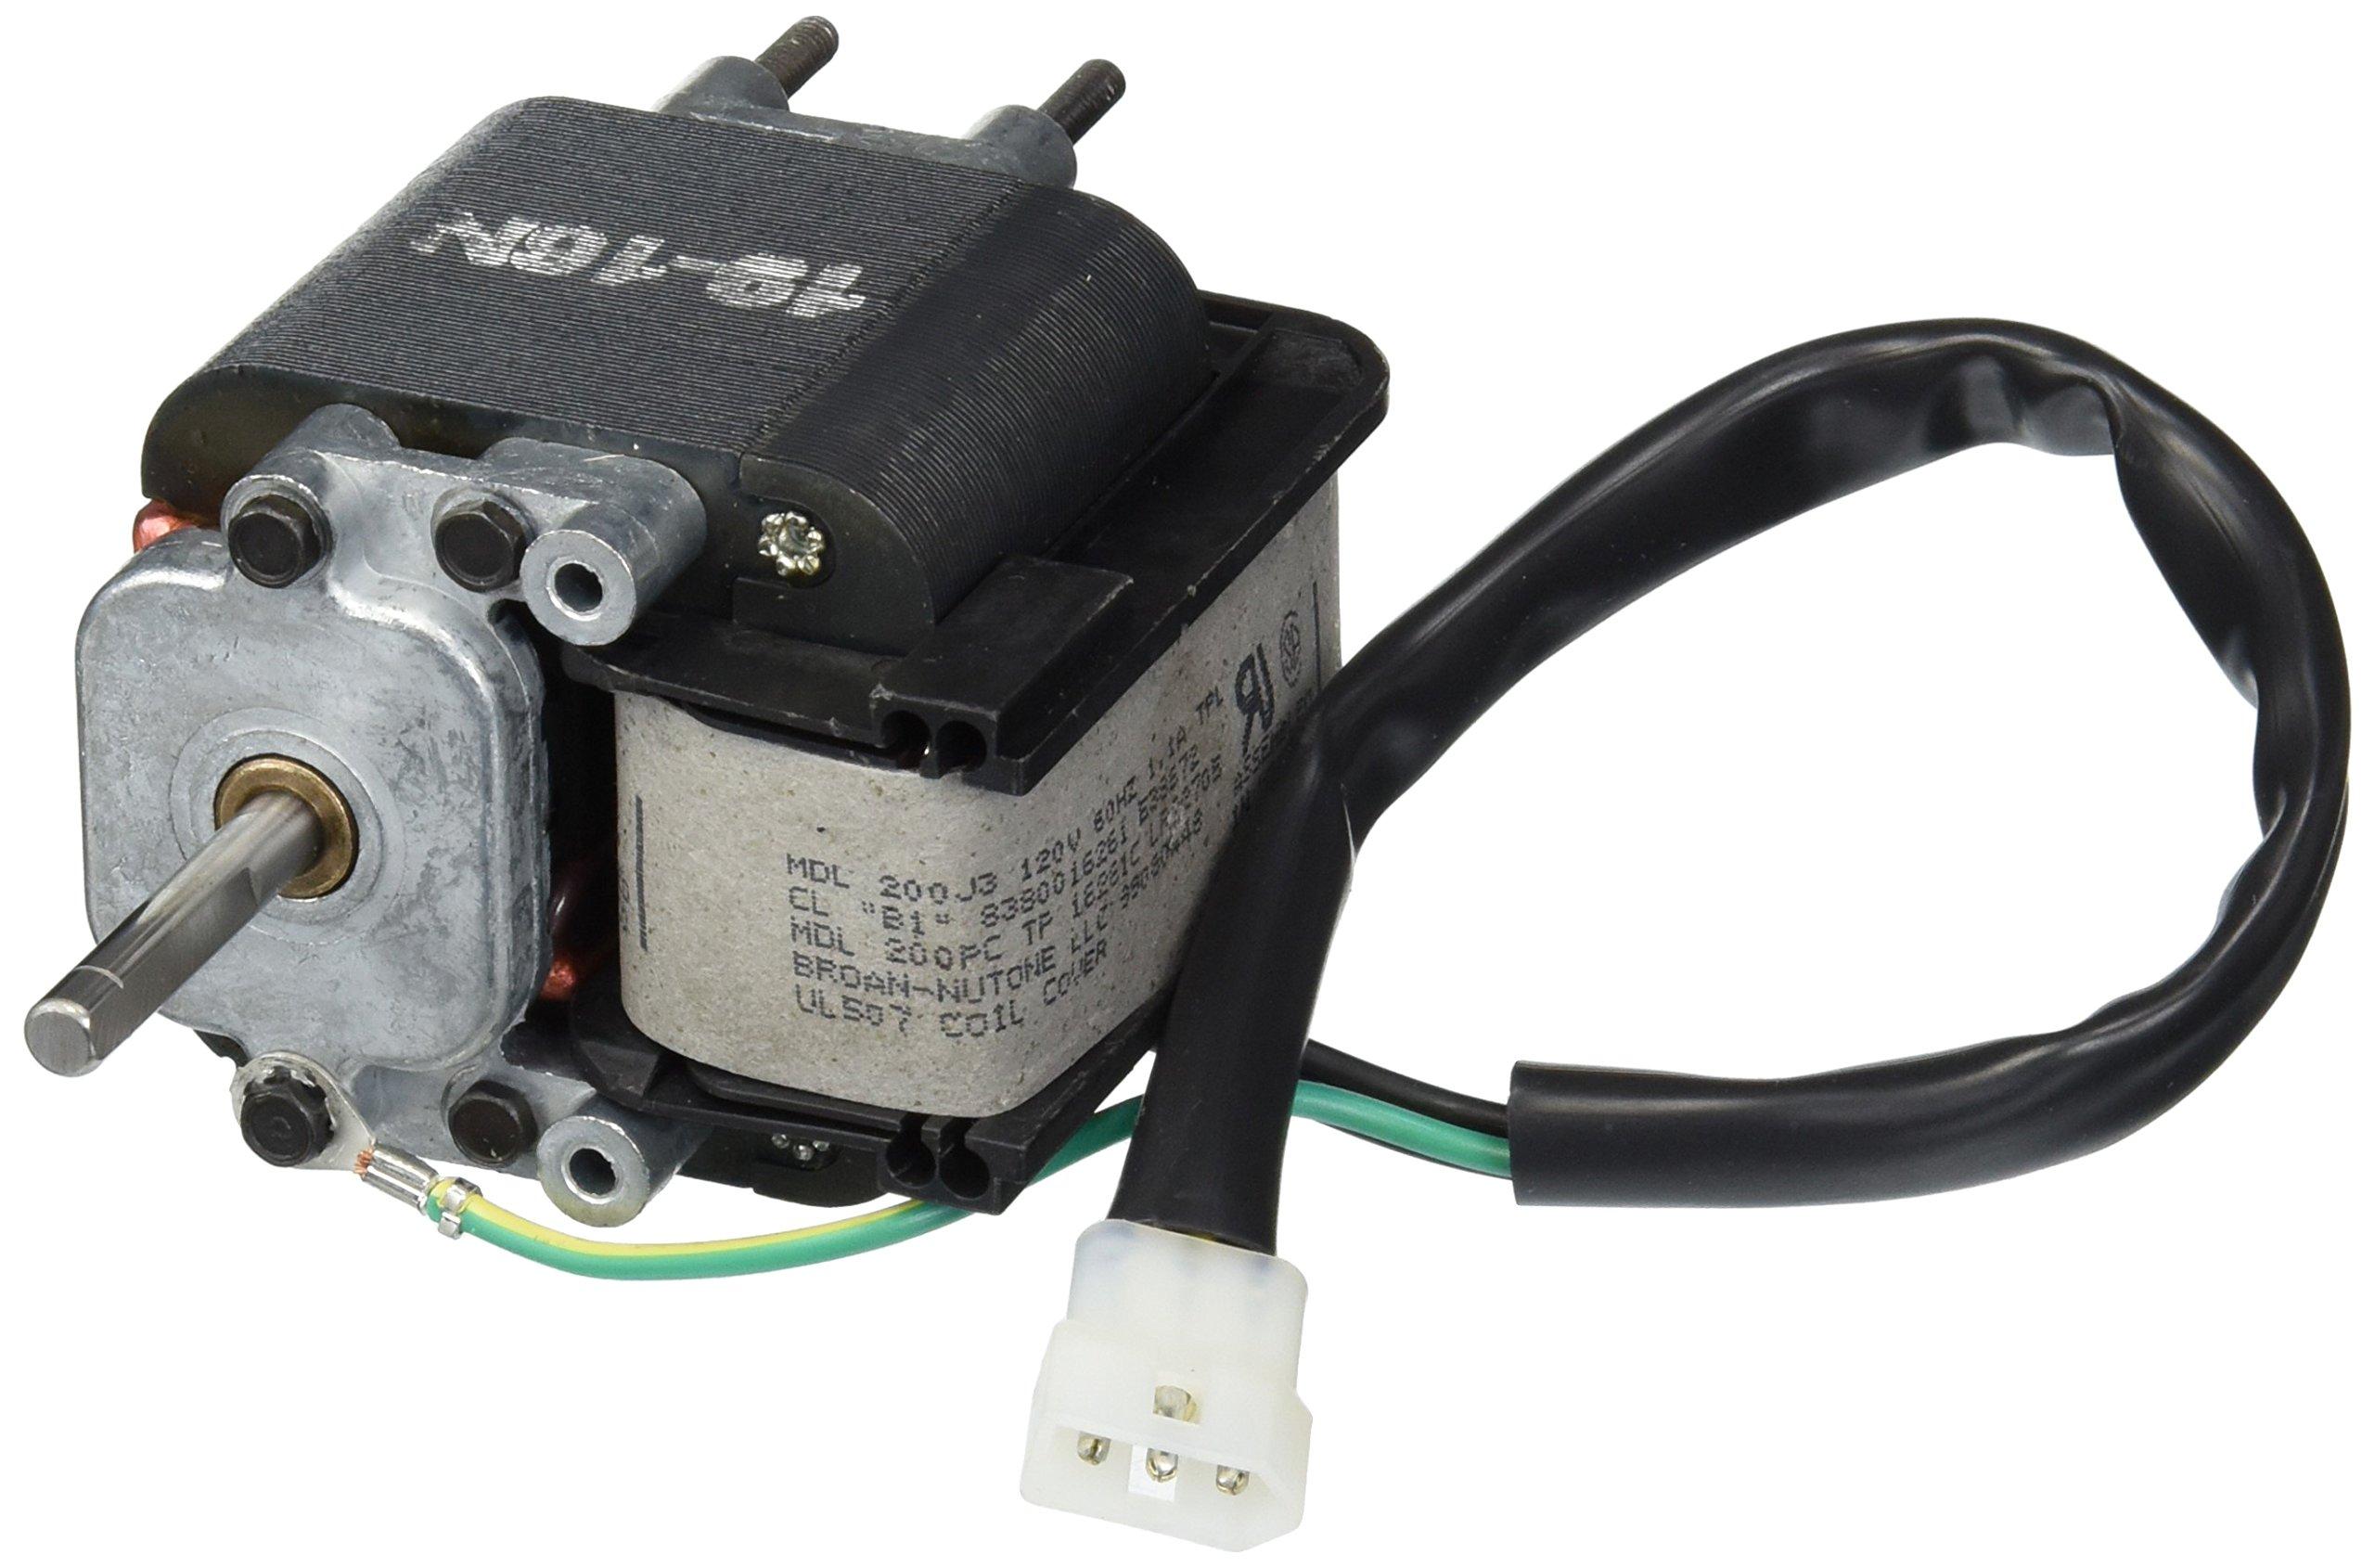 Broan S80U, S80LU Replacement Vent Fan Motor # 99080448, 1.1 amps, 3000 RPM, 120 volts